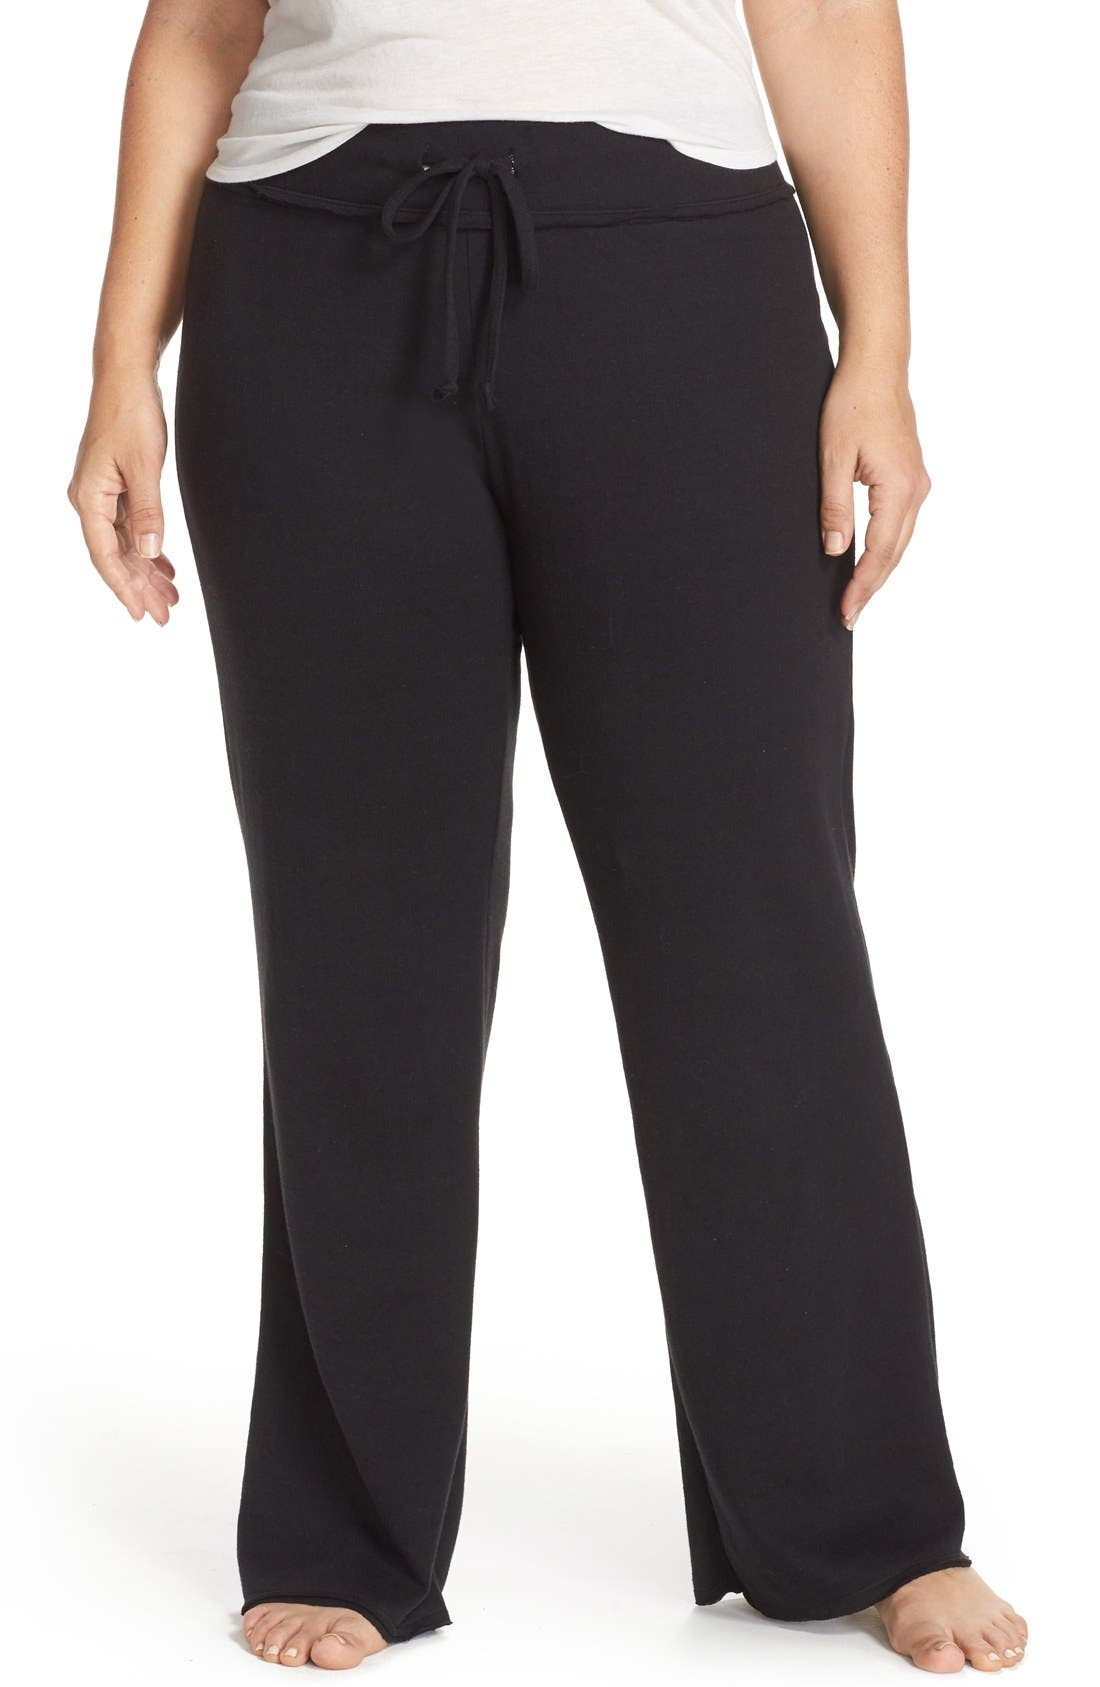 'Lazy Mornings' Lounge Pants,                         Main,                         color, Black